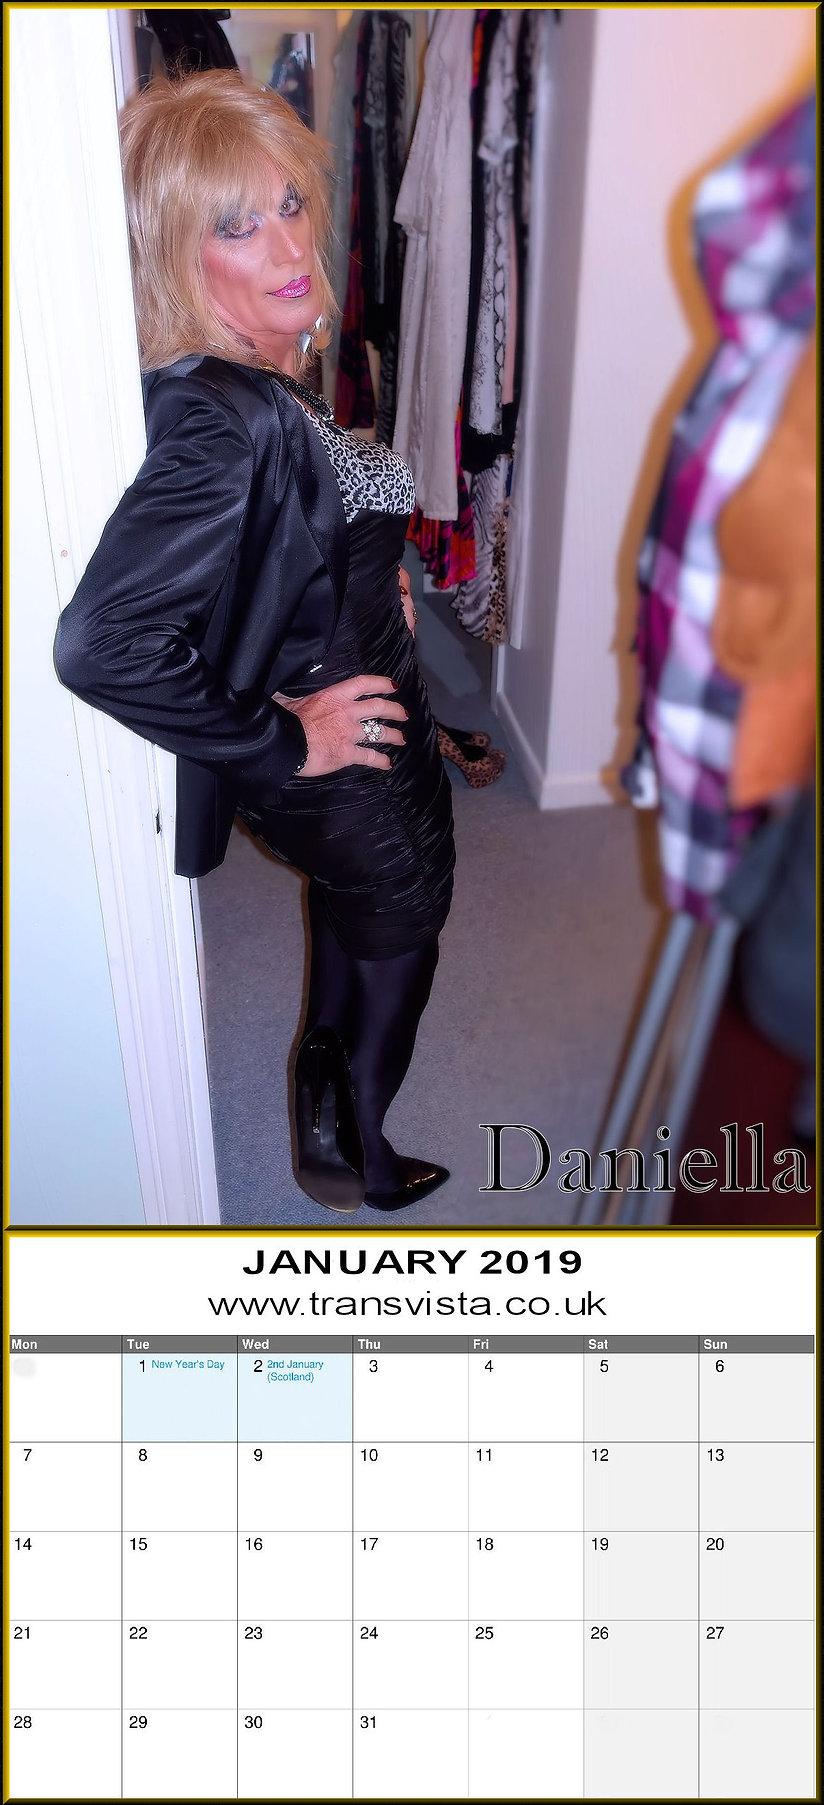 January2019 Calendar Girl.jpg